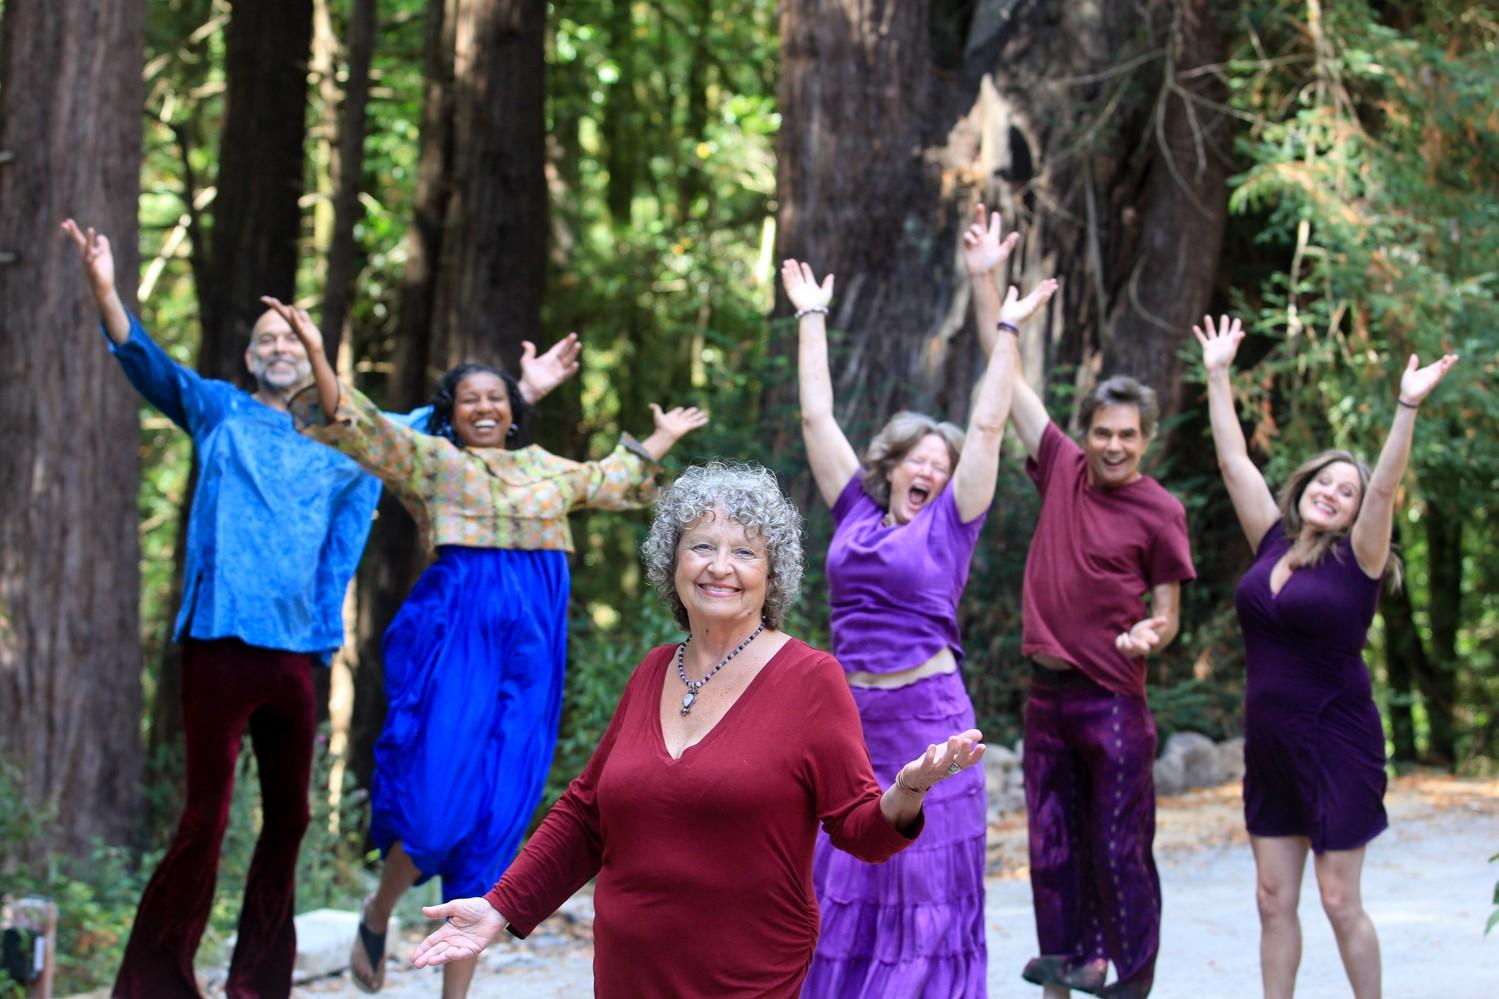 Celebrate your spiritual gifts in Spiritual Mentorship with Evalena Rose.